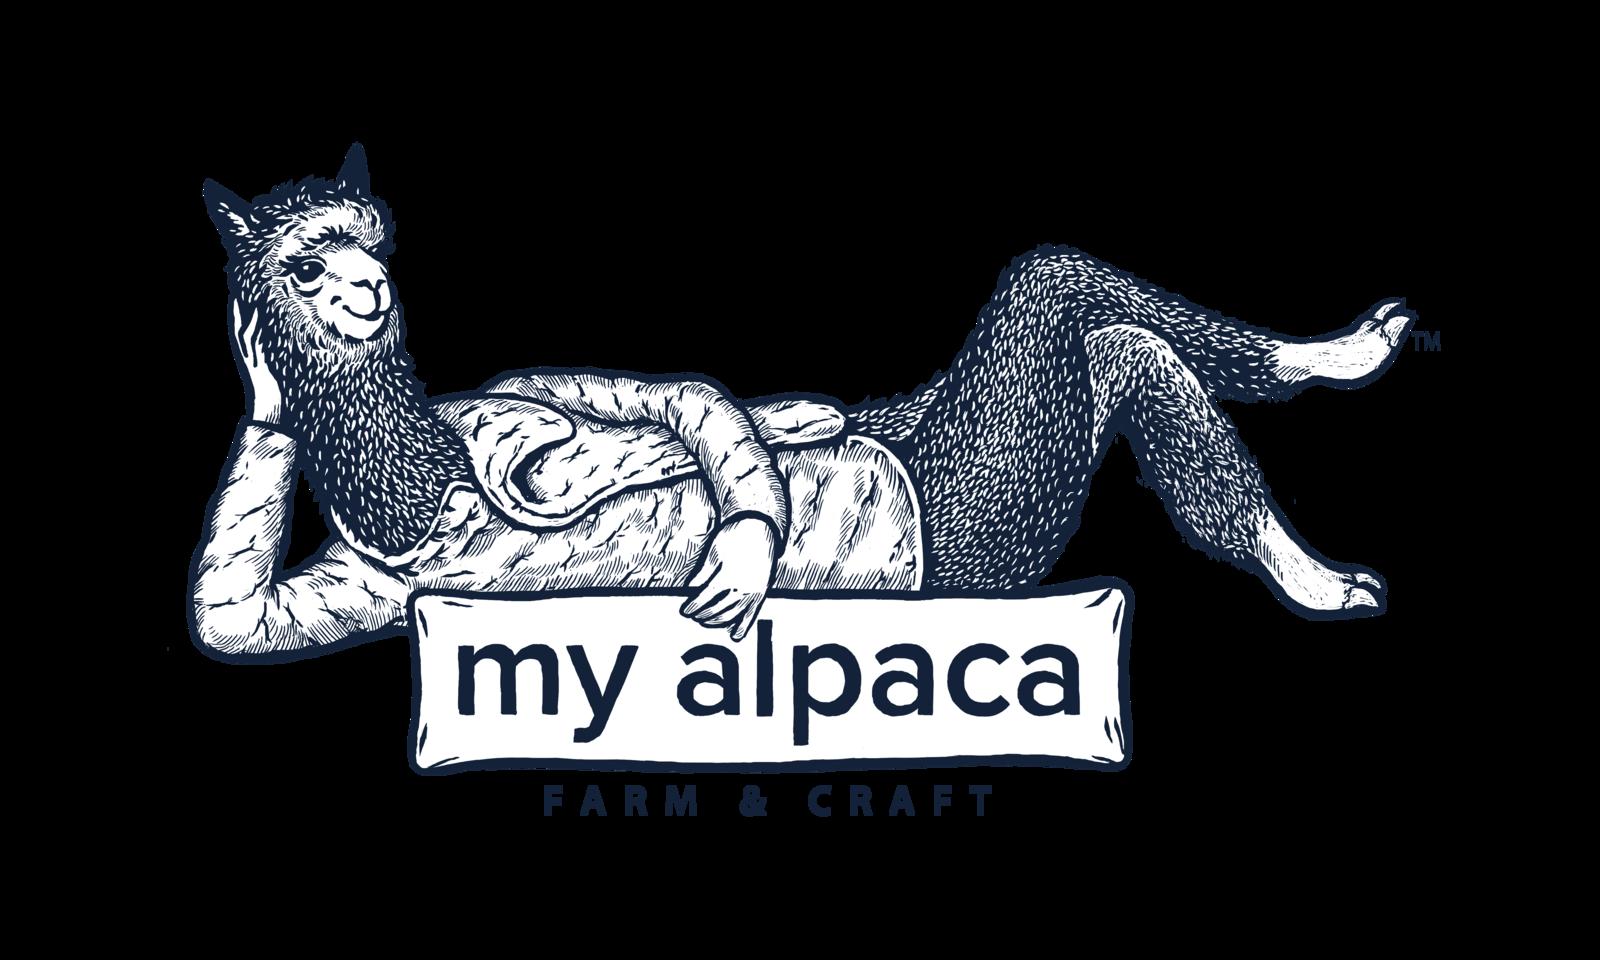 My Alpaca